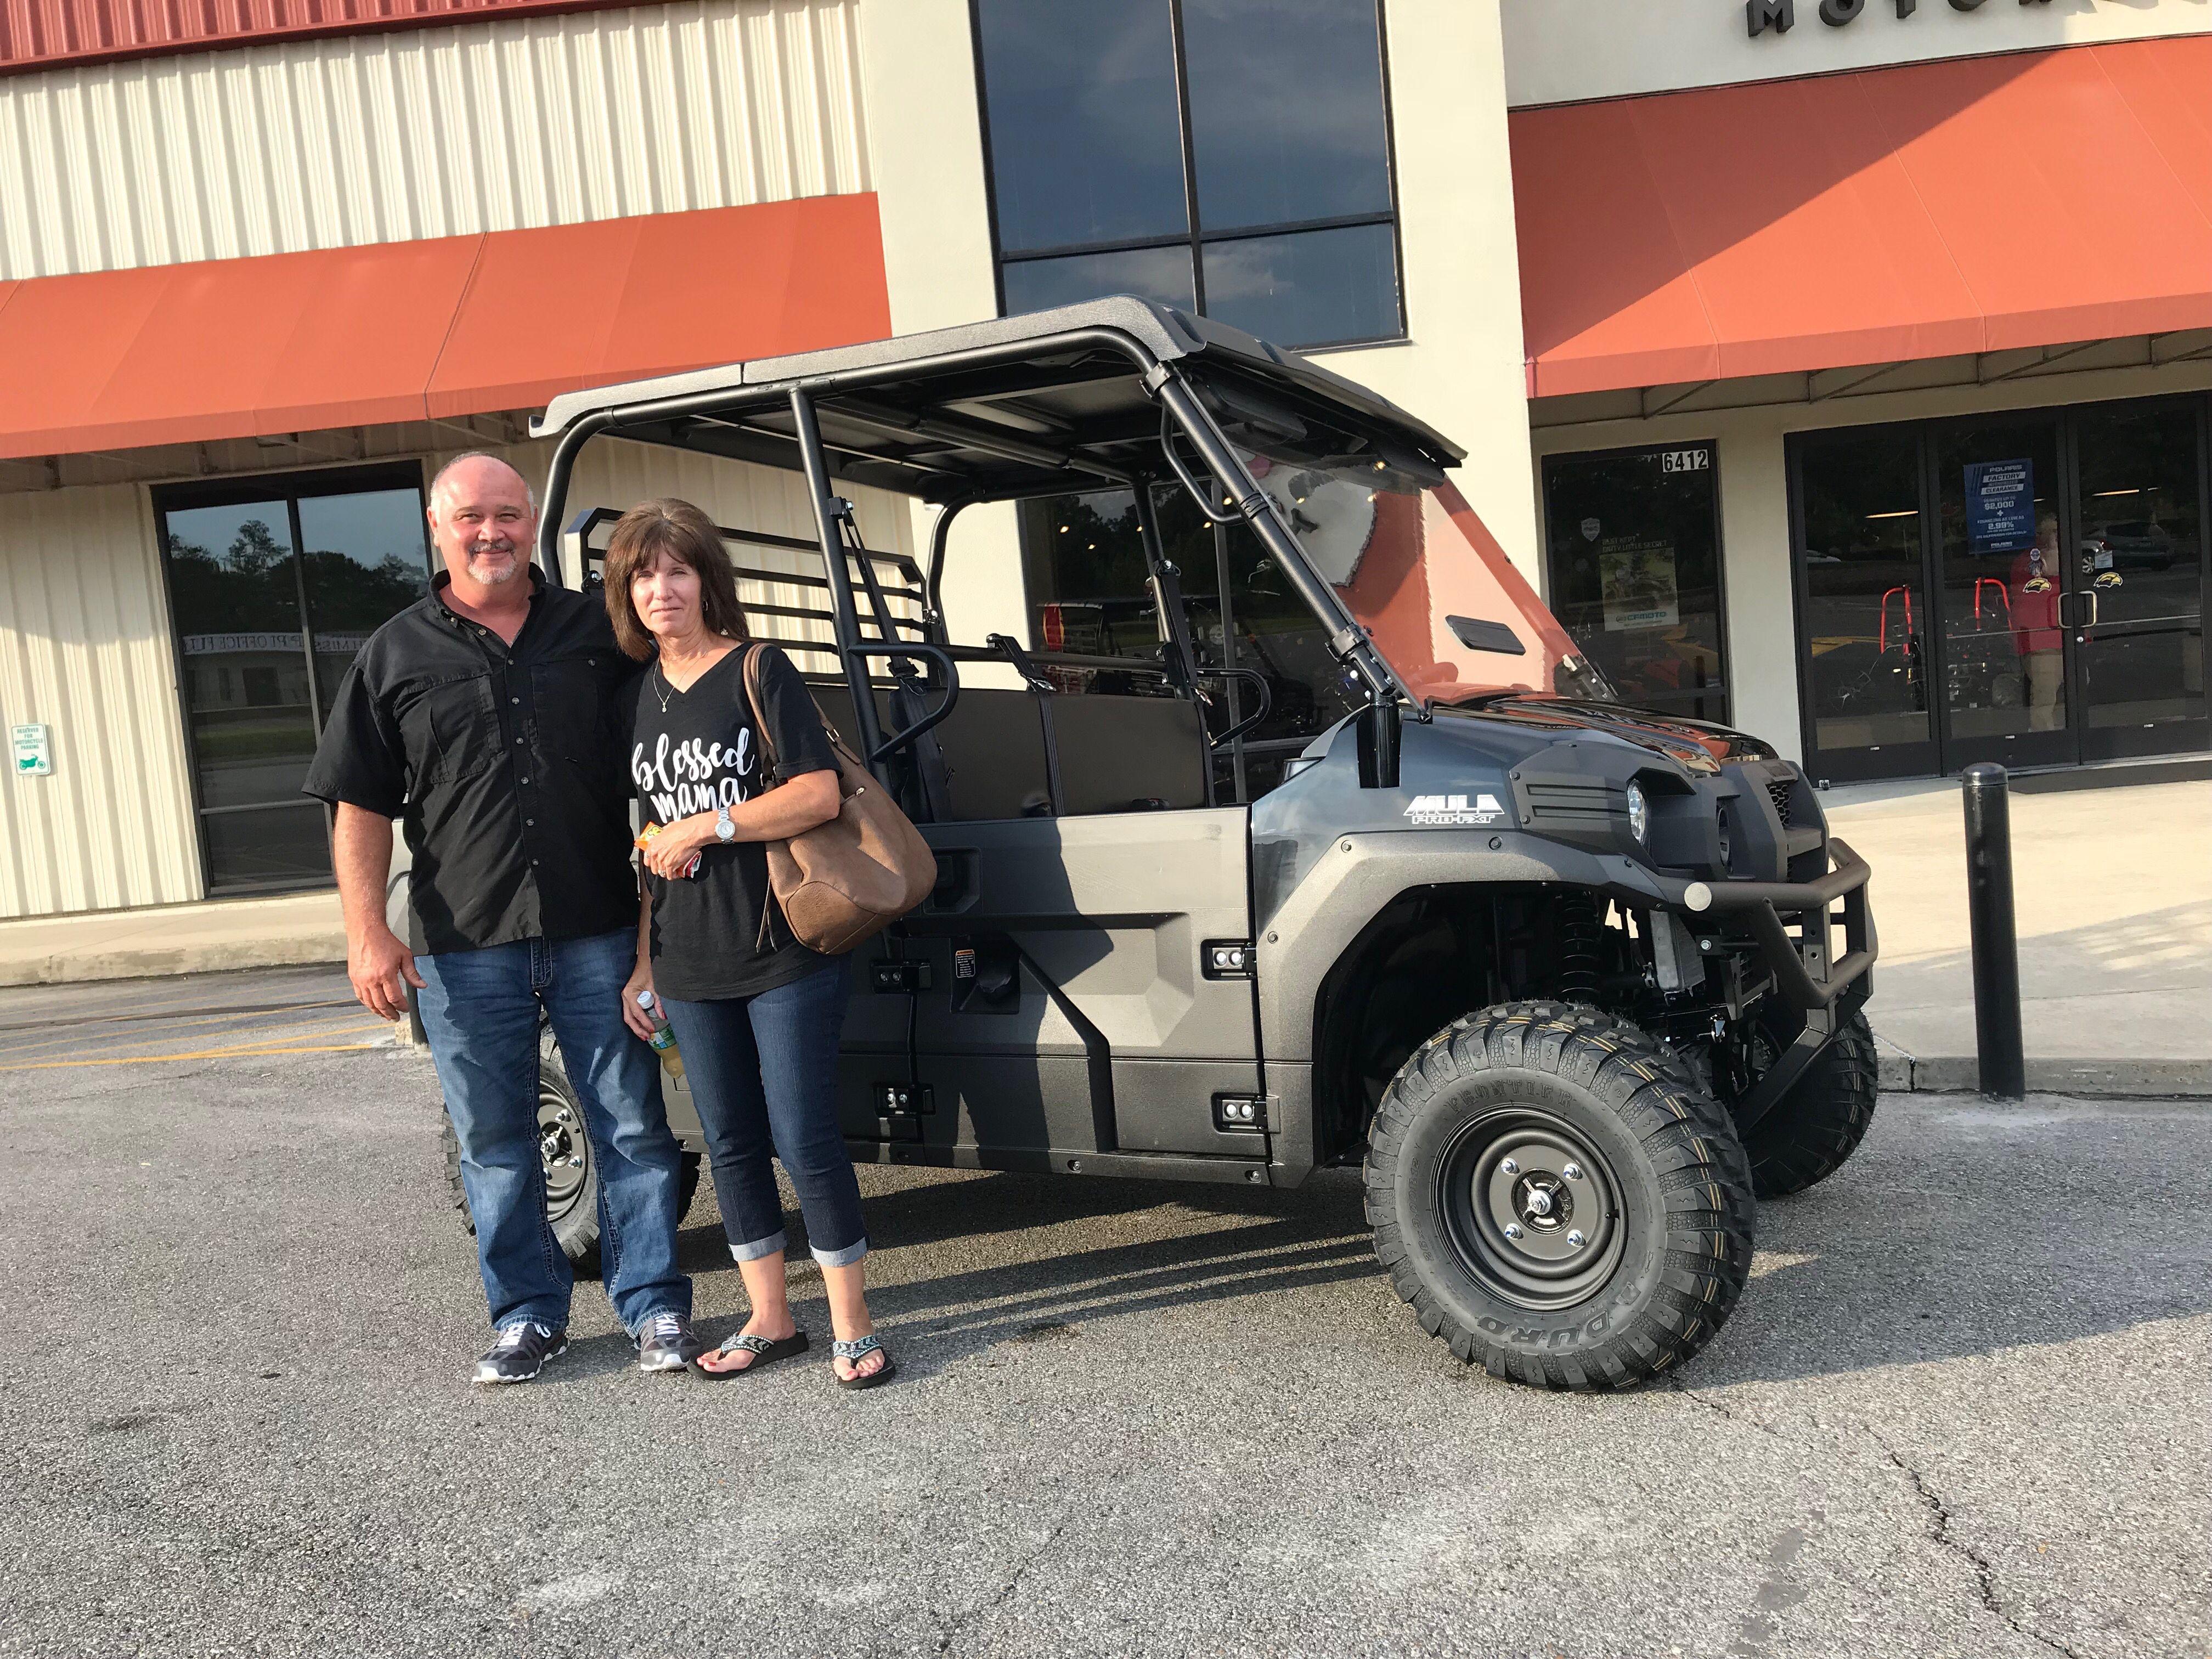 Congratulations To Kendall And Deborah Hughes From Lake MS For Purchasing A 2019 Kawasaki Mule Pro FXT At Hattiesburg Cycles